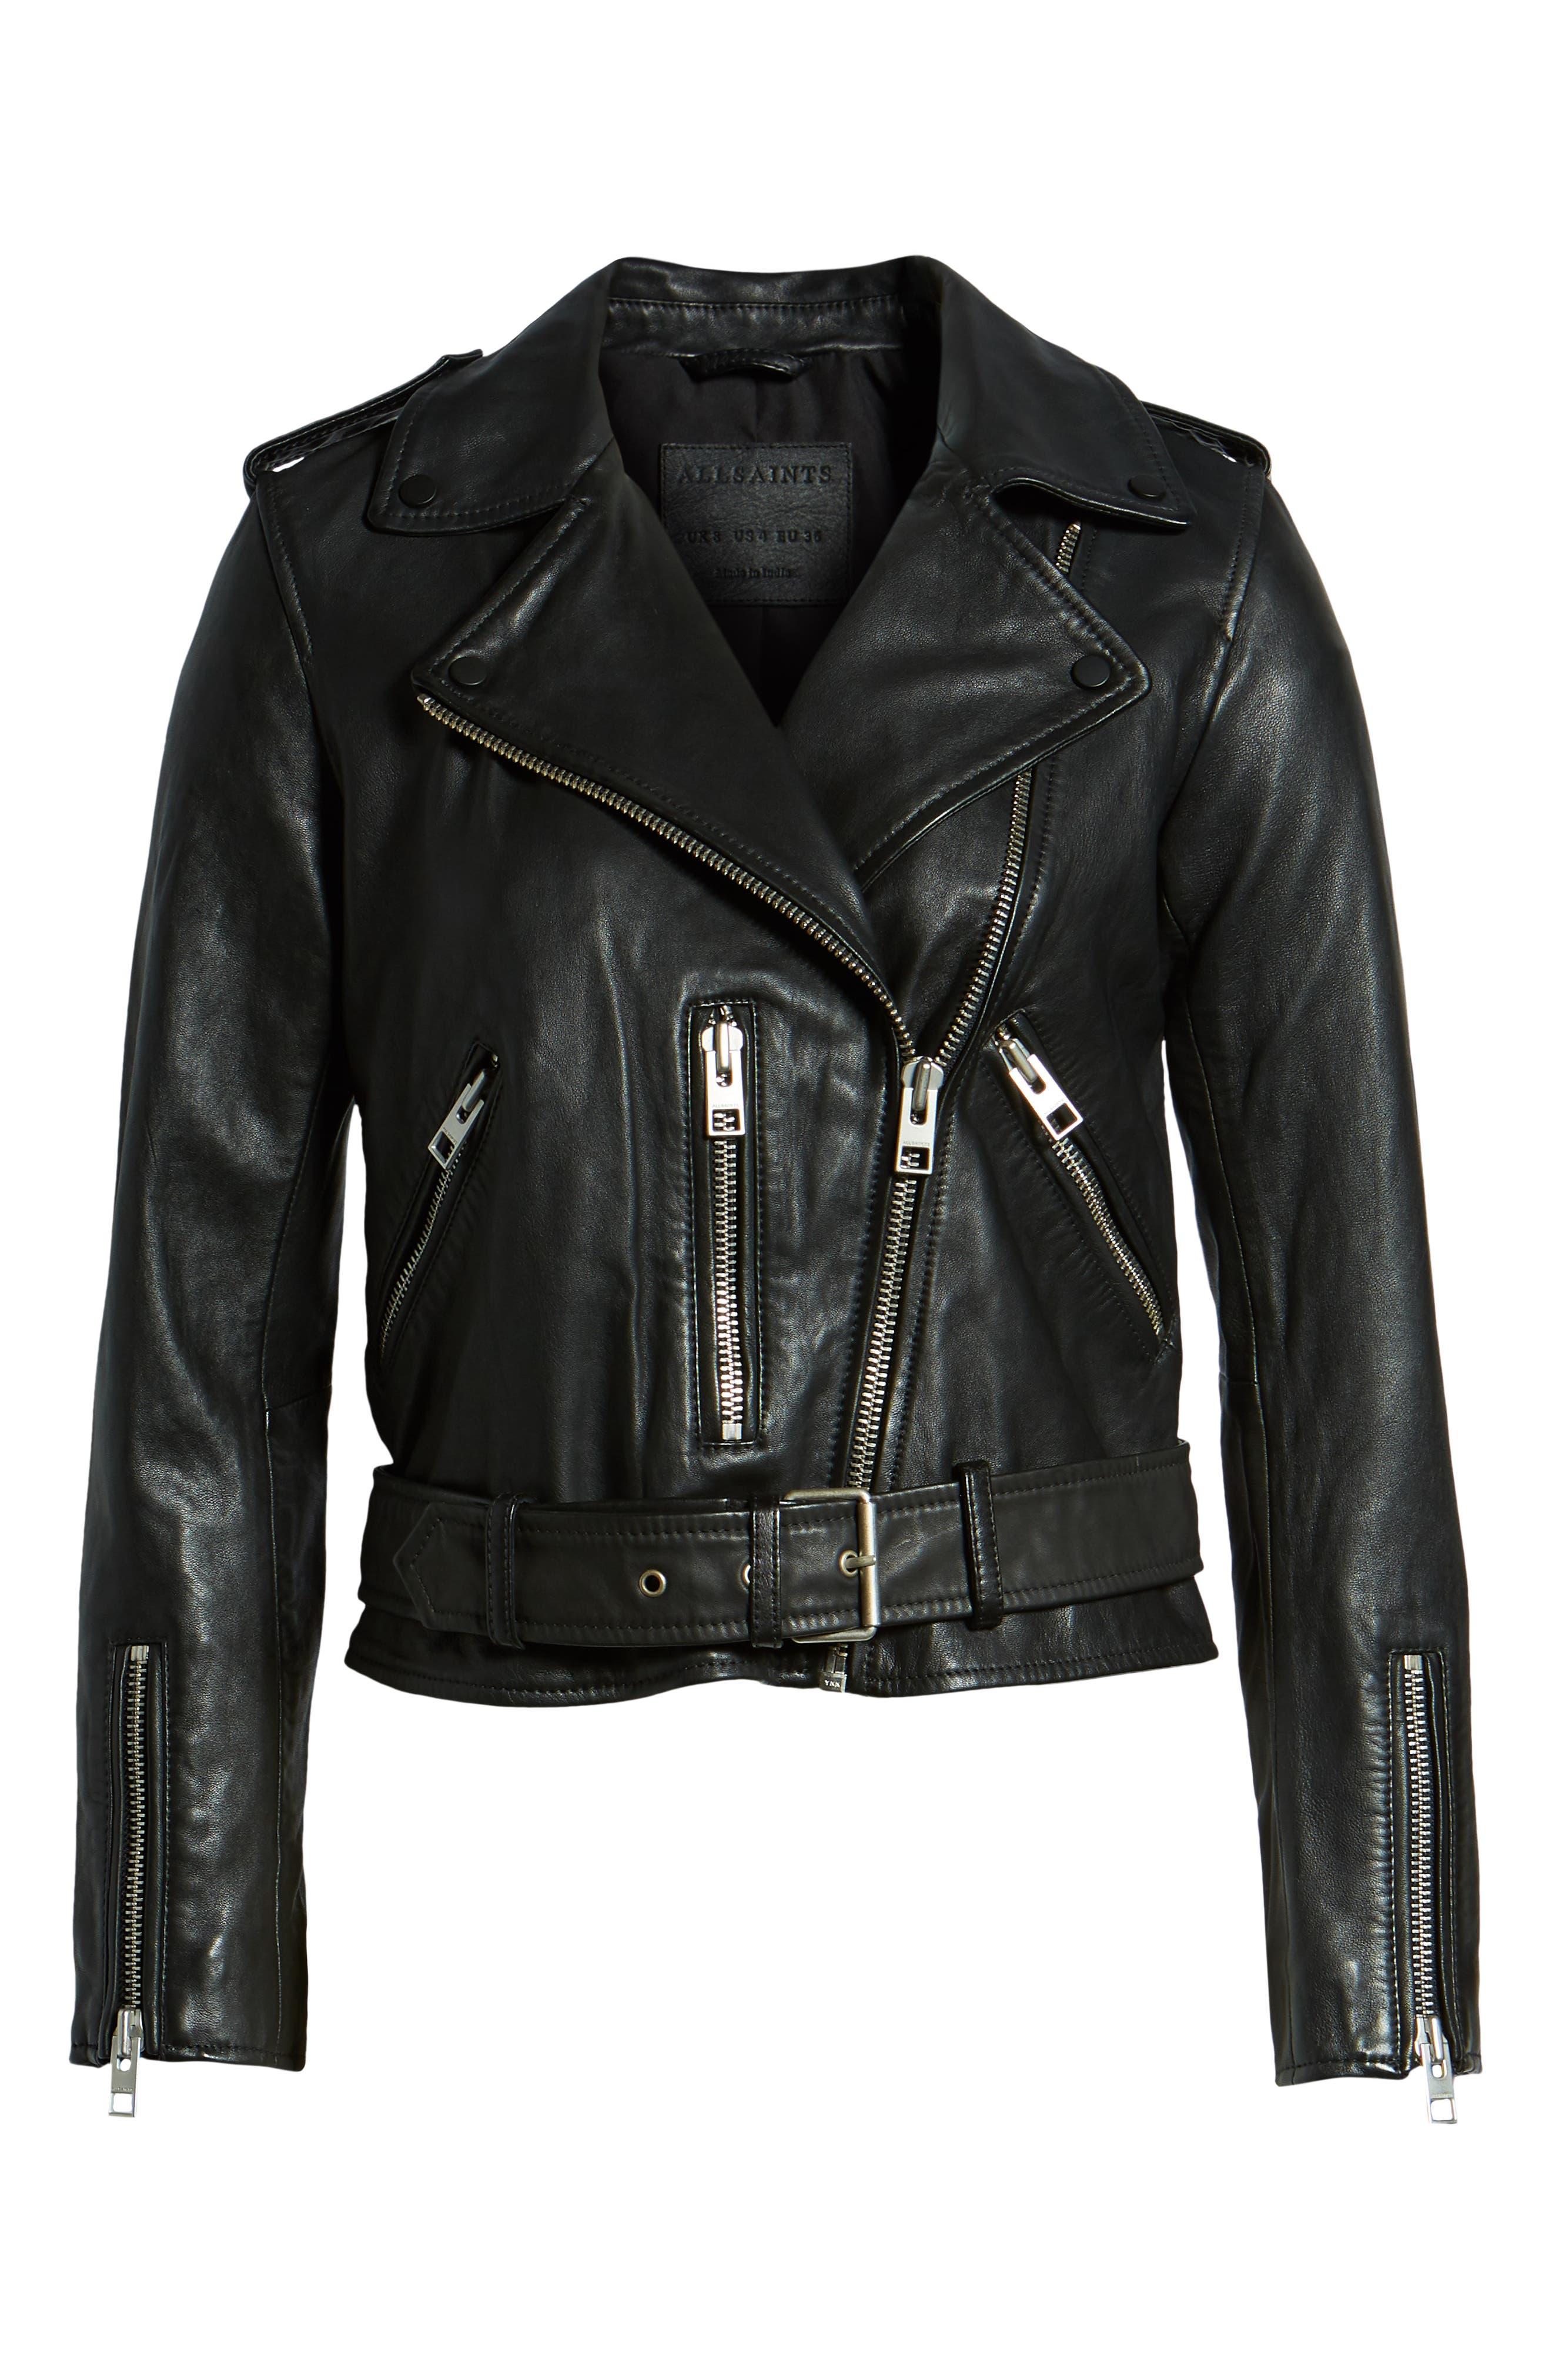 ALLSAINTS, Balfern Leather Biker Jacket, Alternate thumbnail 6, color, BLACK